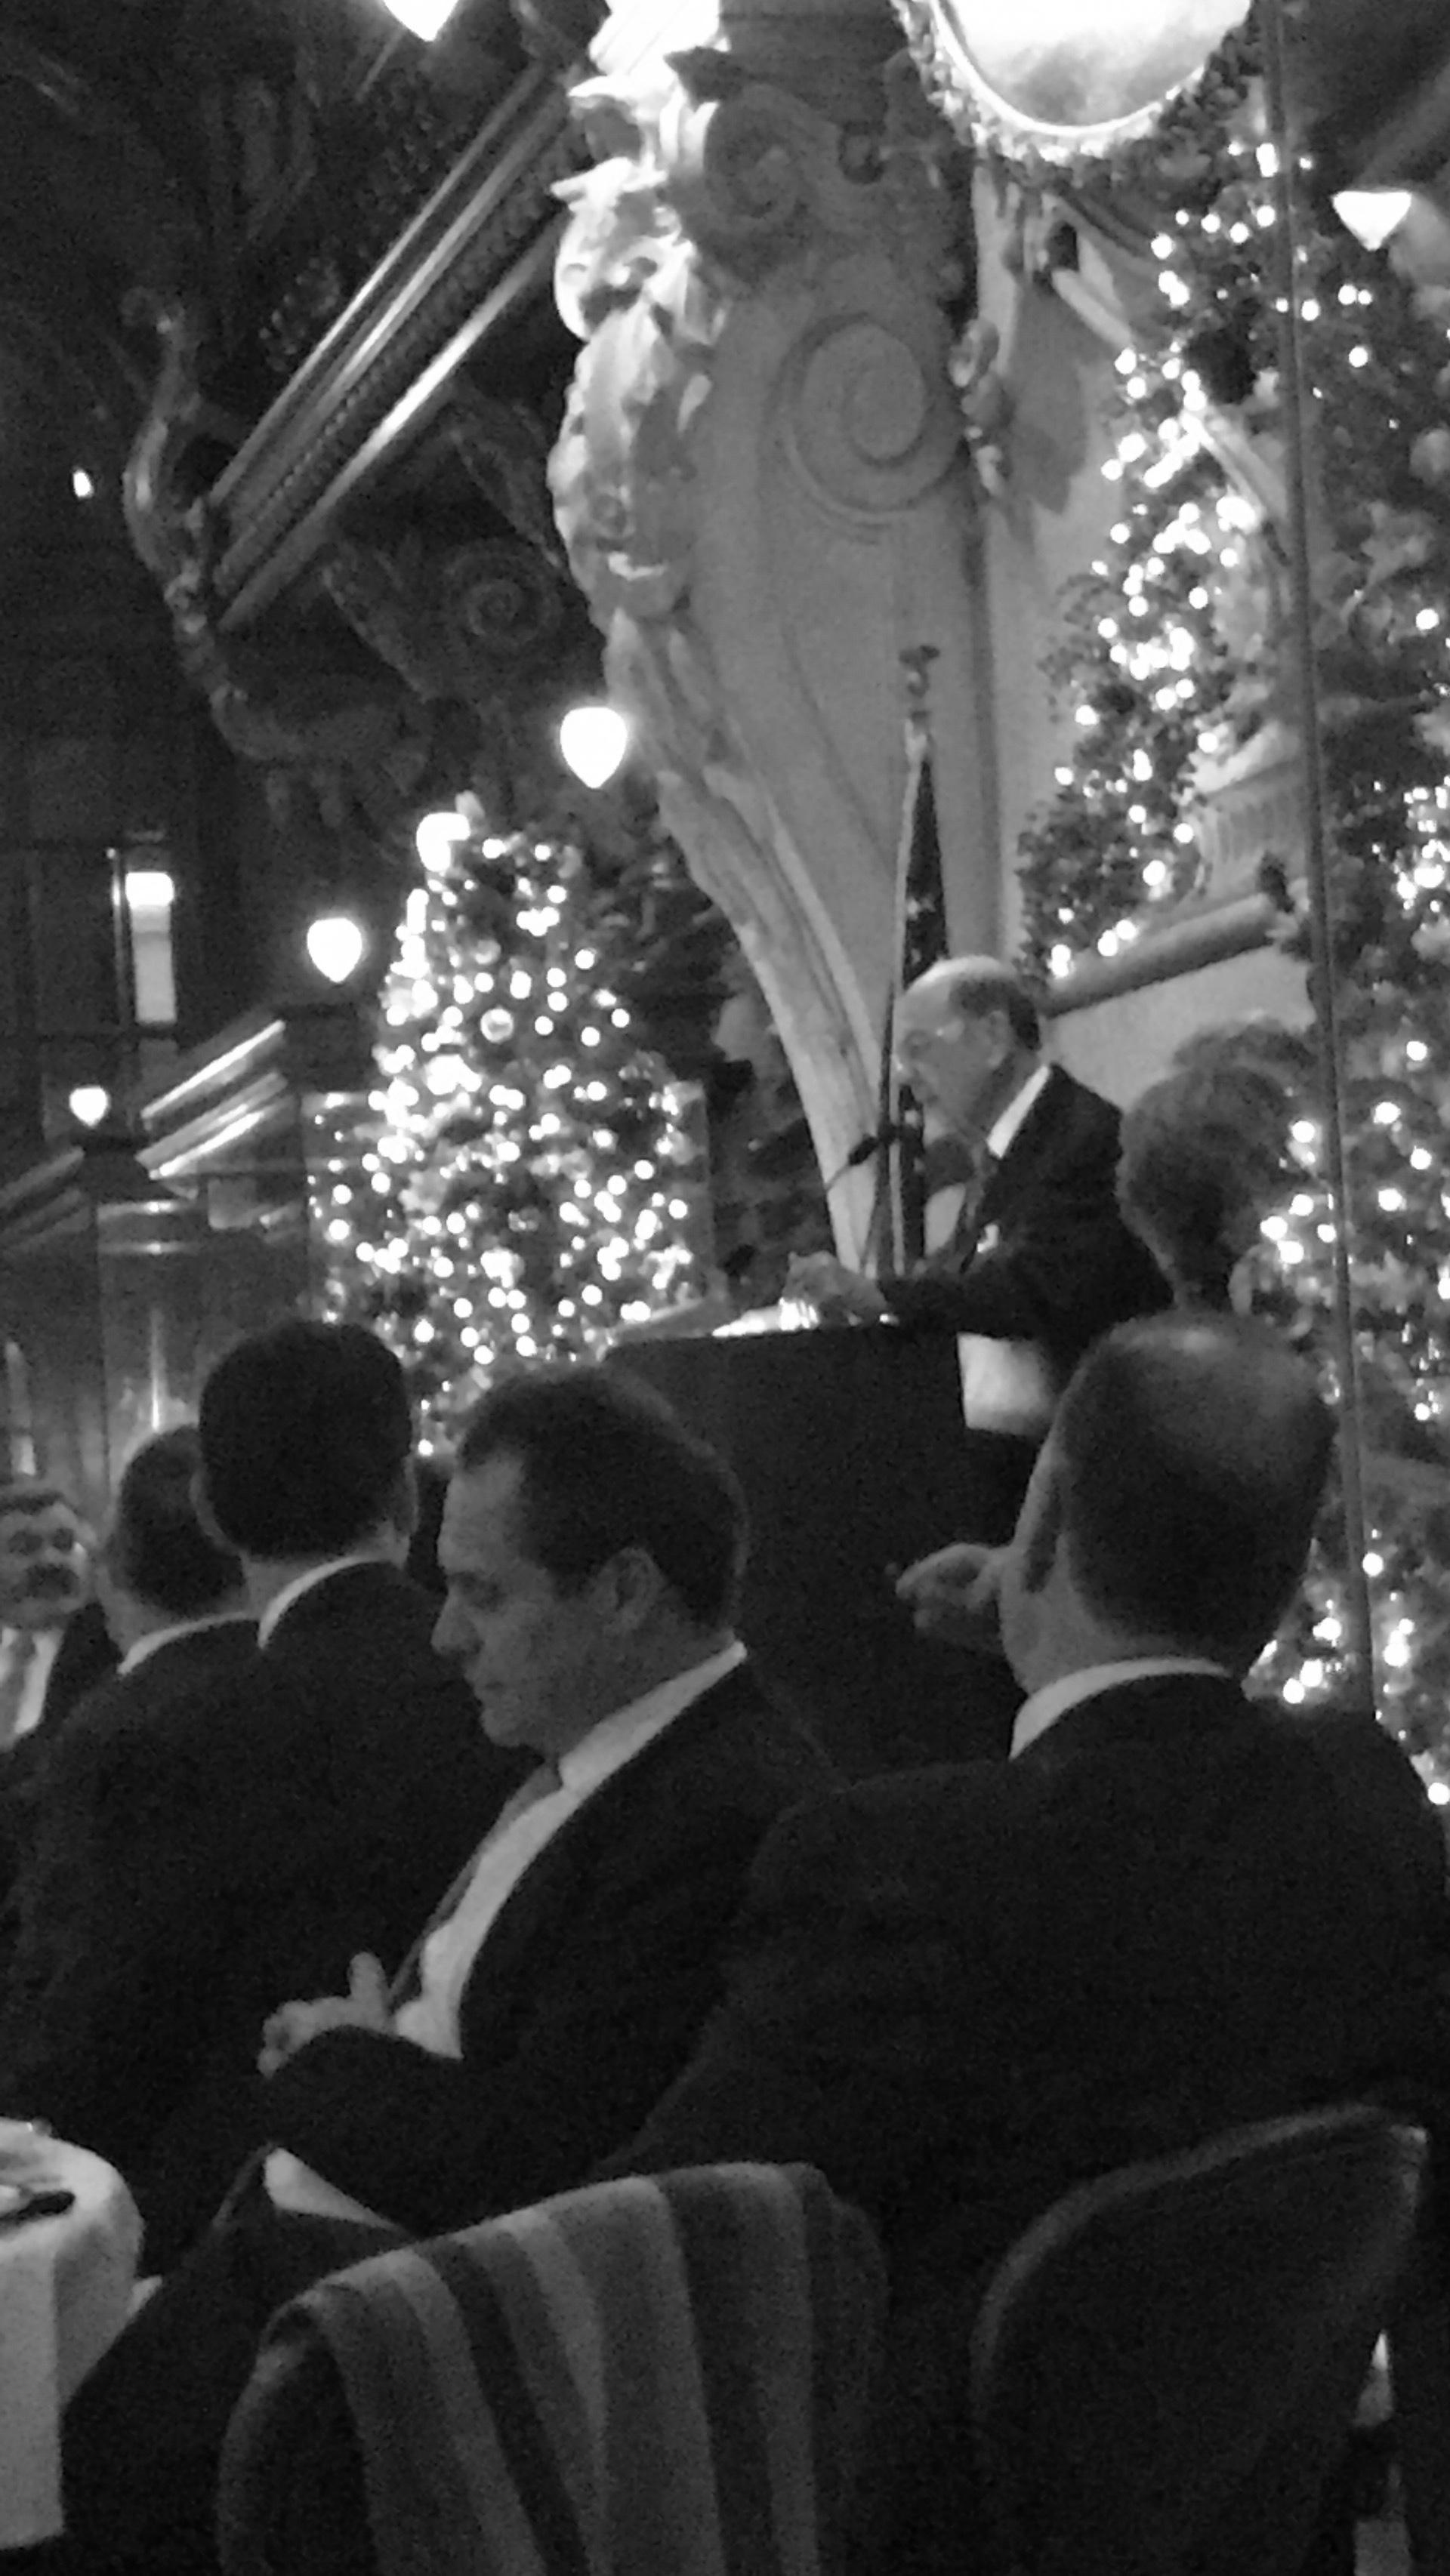 United States Secretary of Commerce Wilbur Ross gave a great dinner speech.